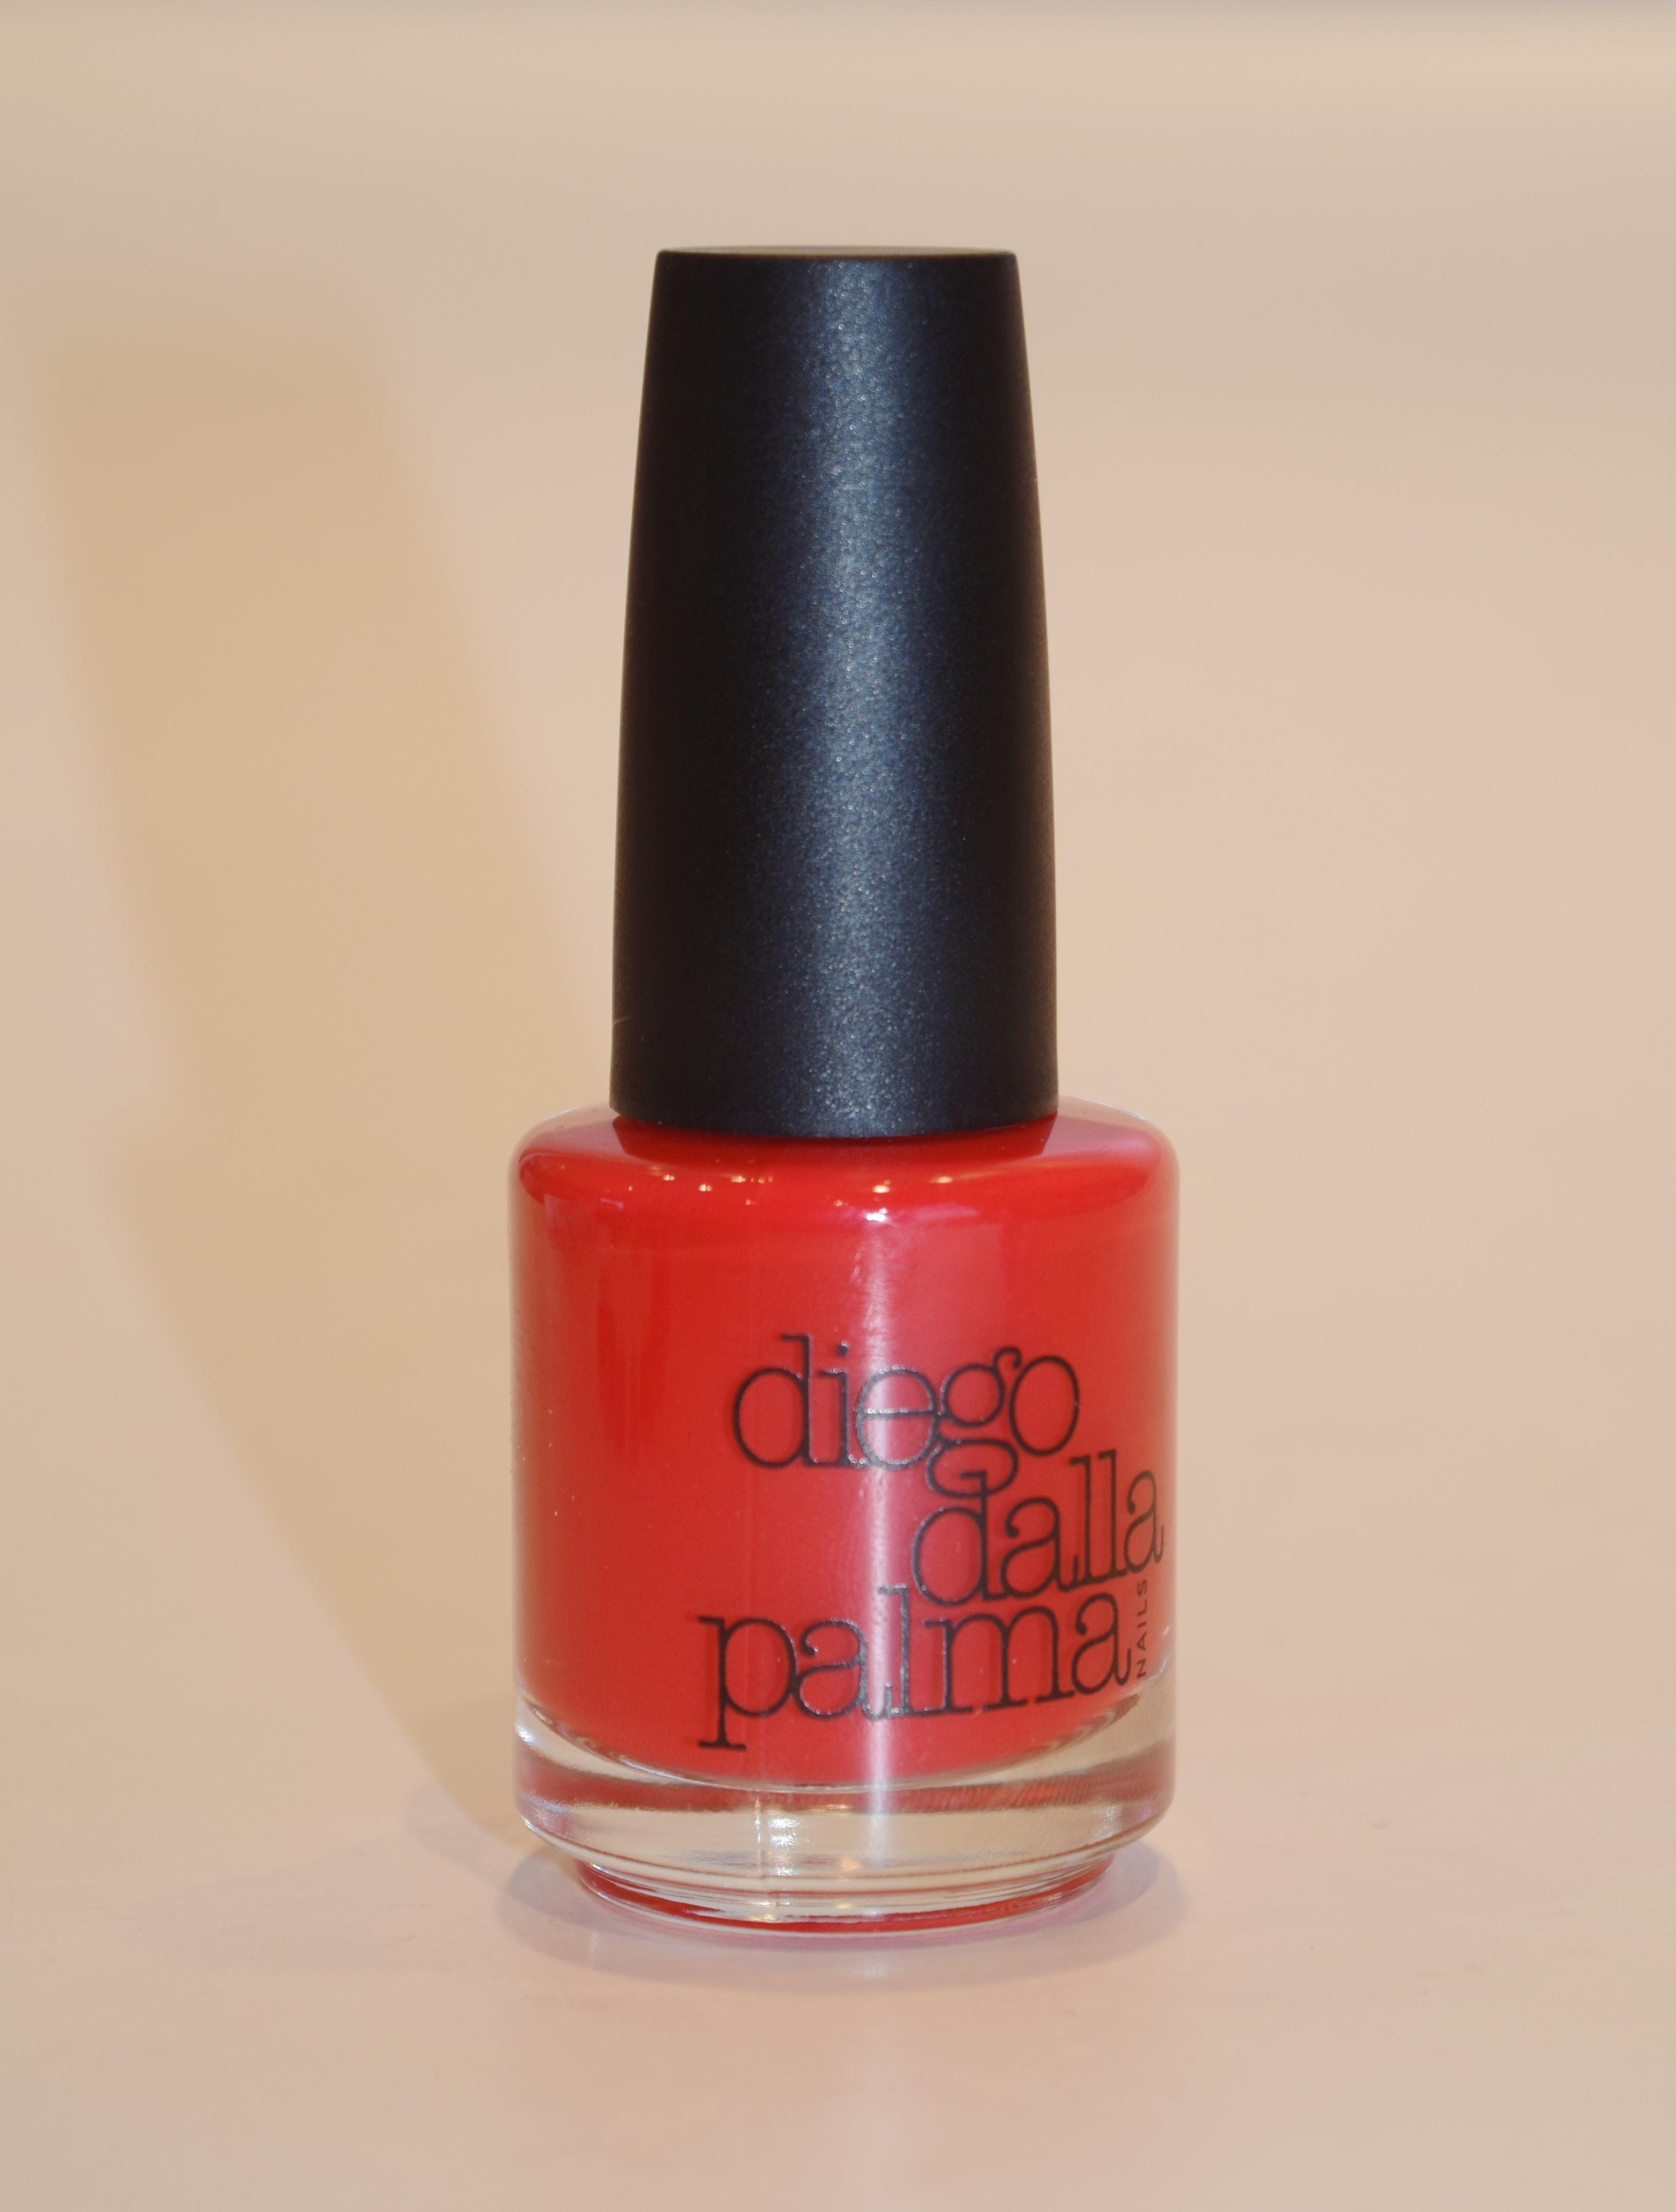 Diego dalla palma red passion nail varnish the luxe list - Diego dalla palma ...